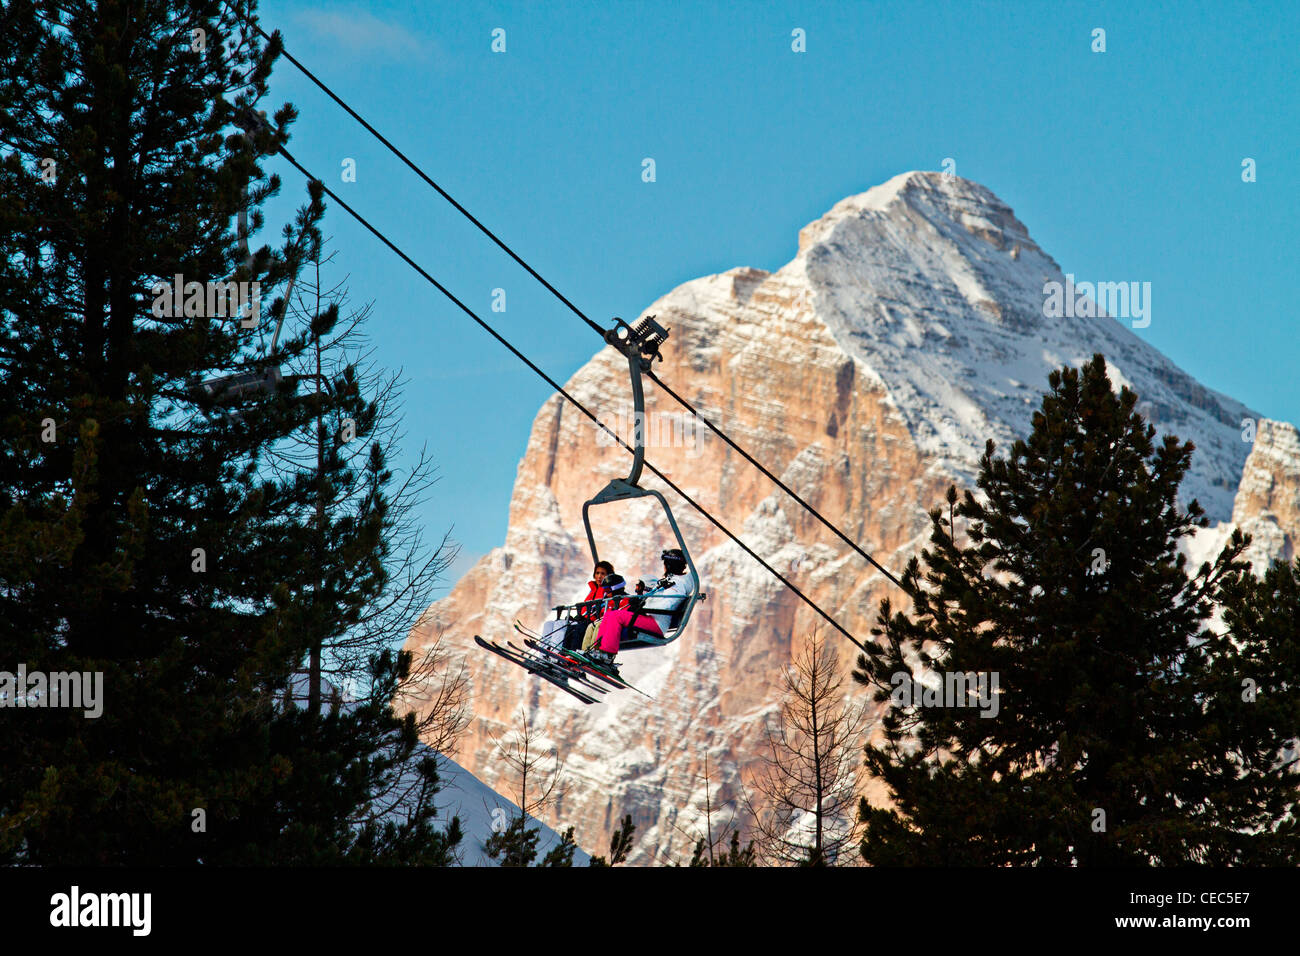 Skiers on a ski lift with Tofana di Rozes in the background, Faloria ski lift, Dolomites, Cortina d;Ampezzo, Italy - Stock Image